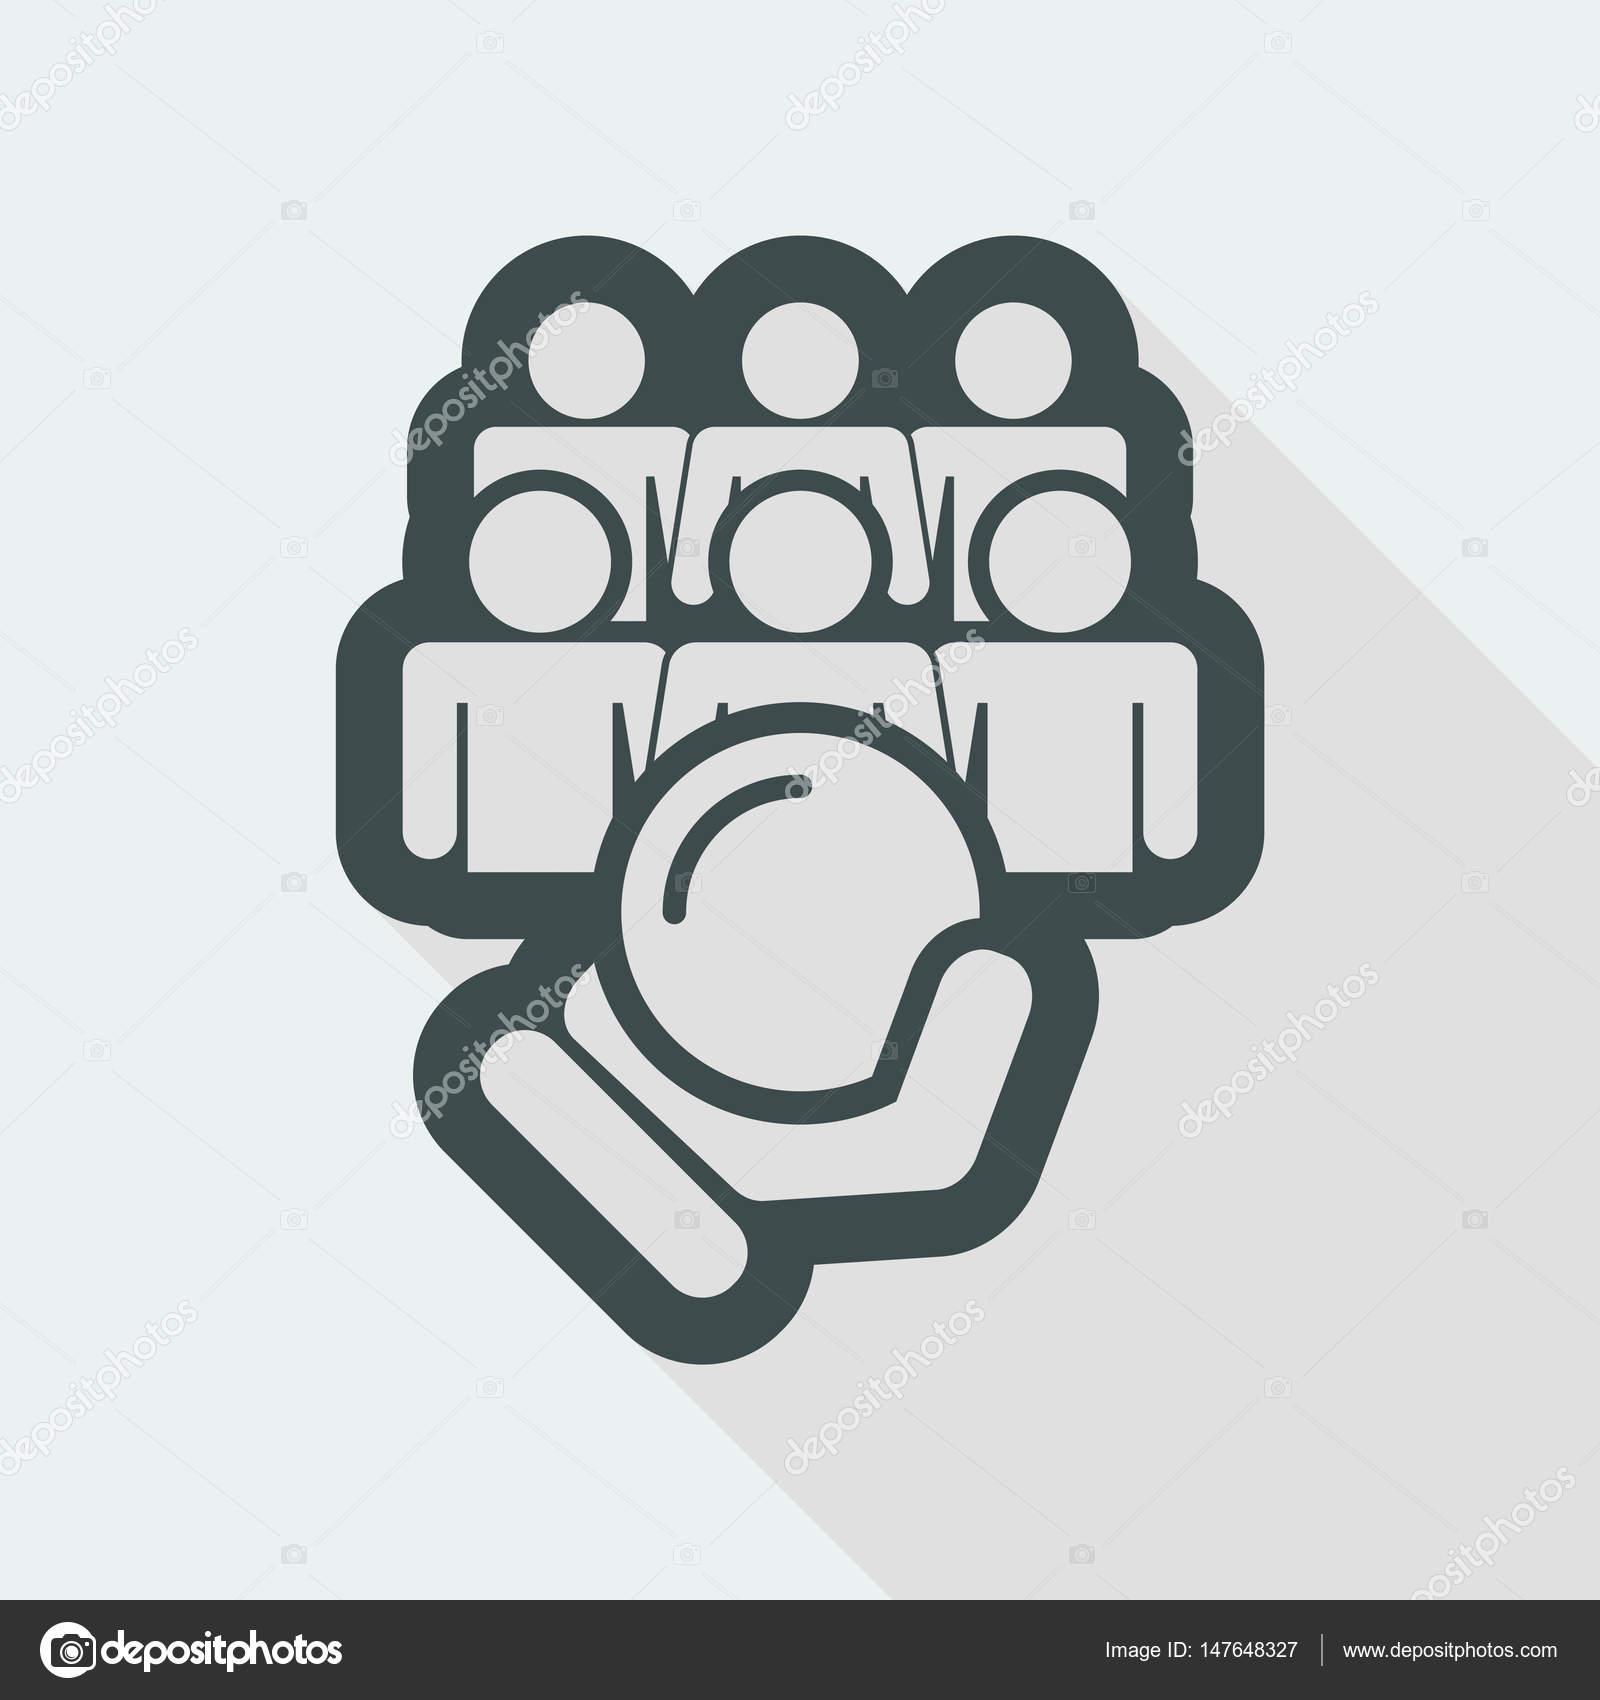 Human strike icon — Stock Vector © MyVector #147648327